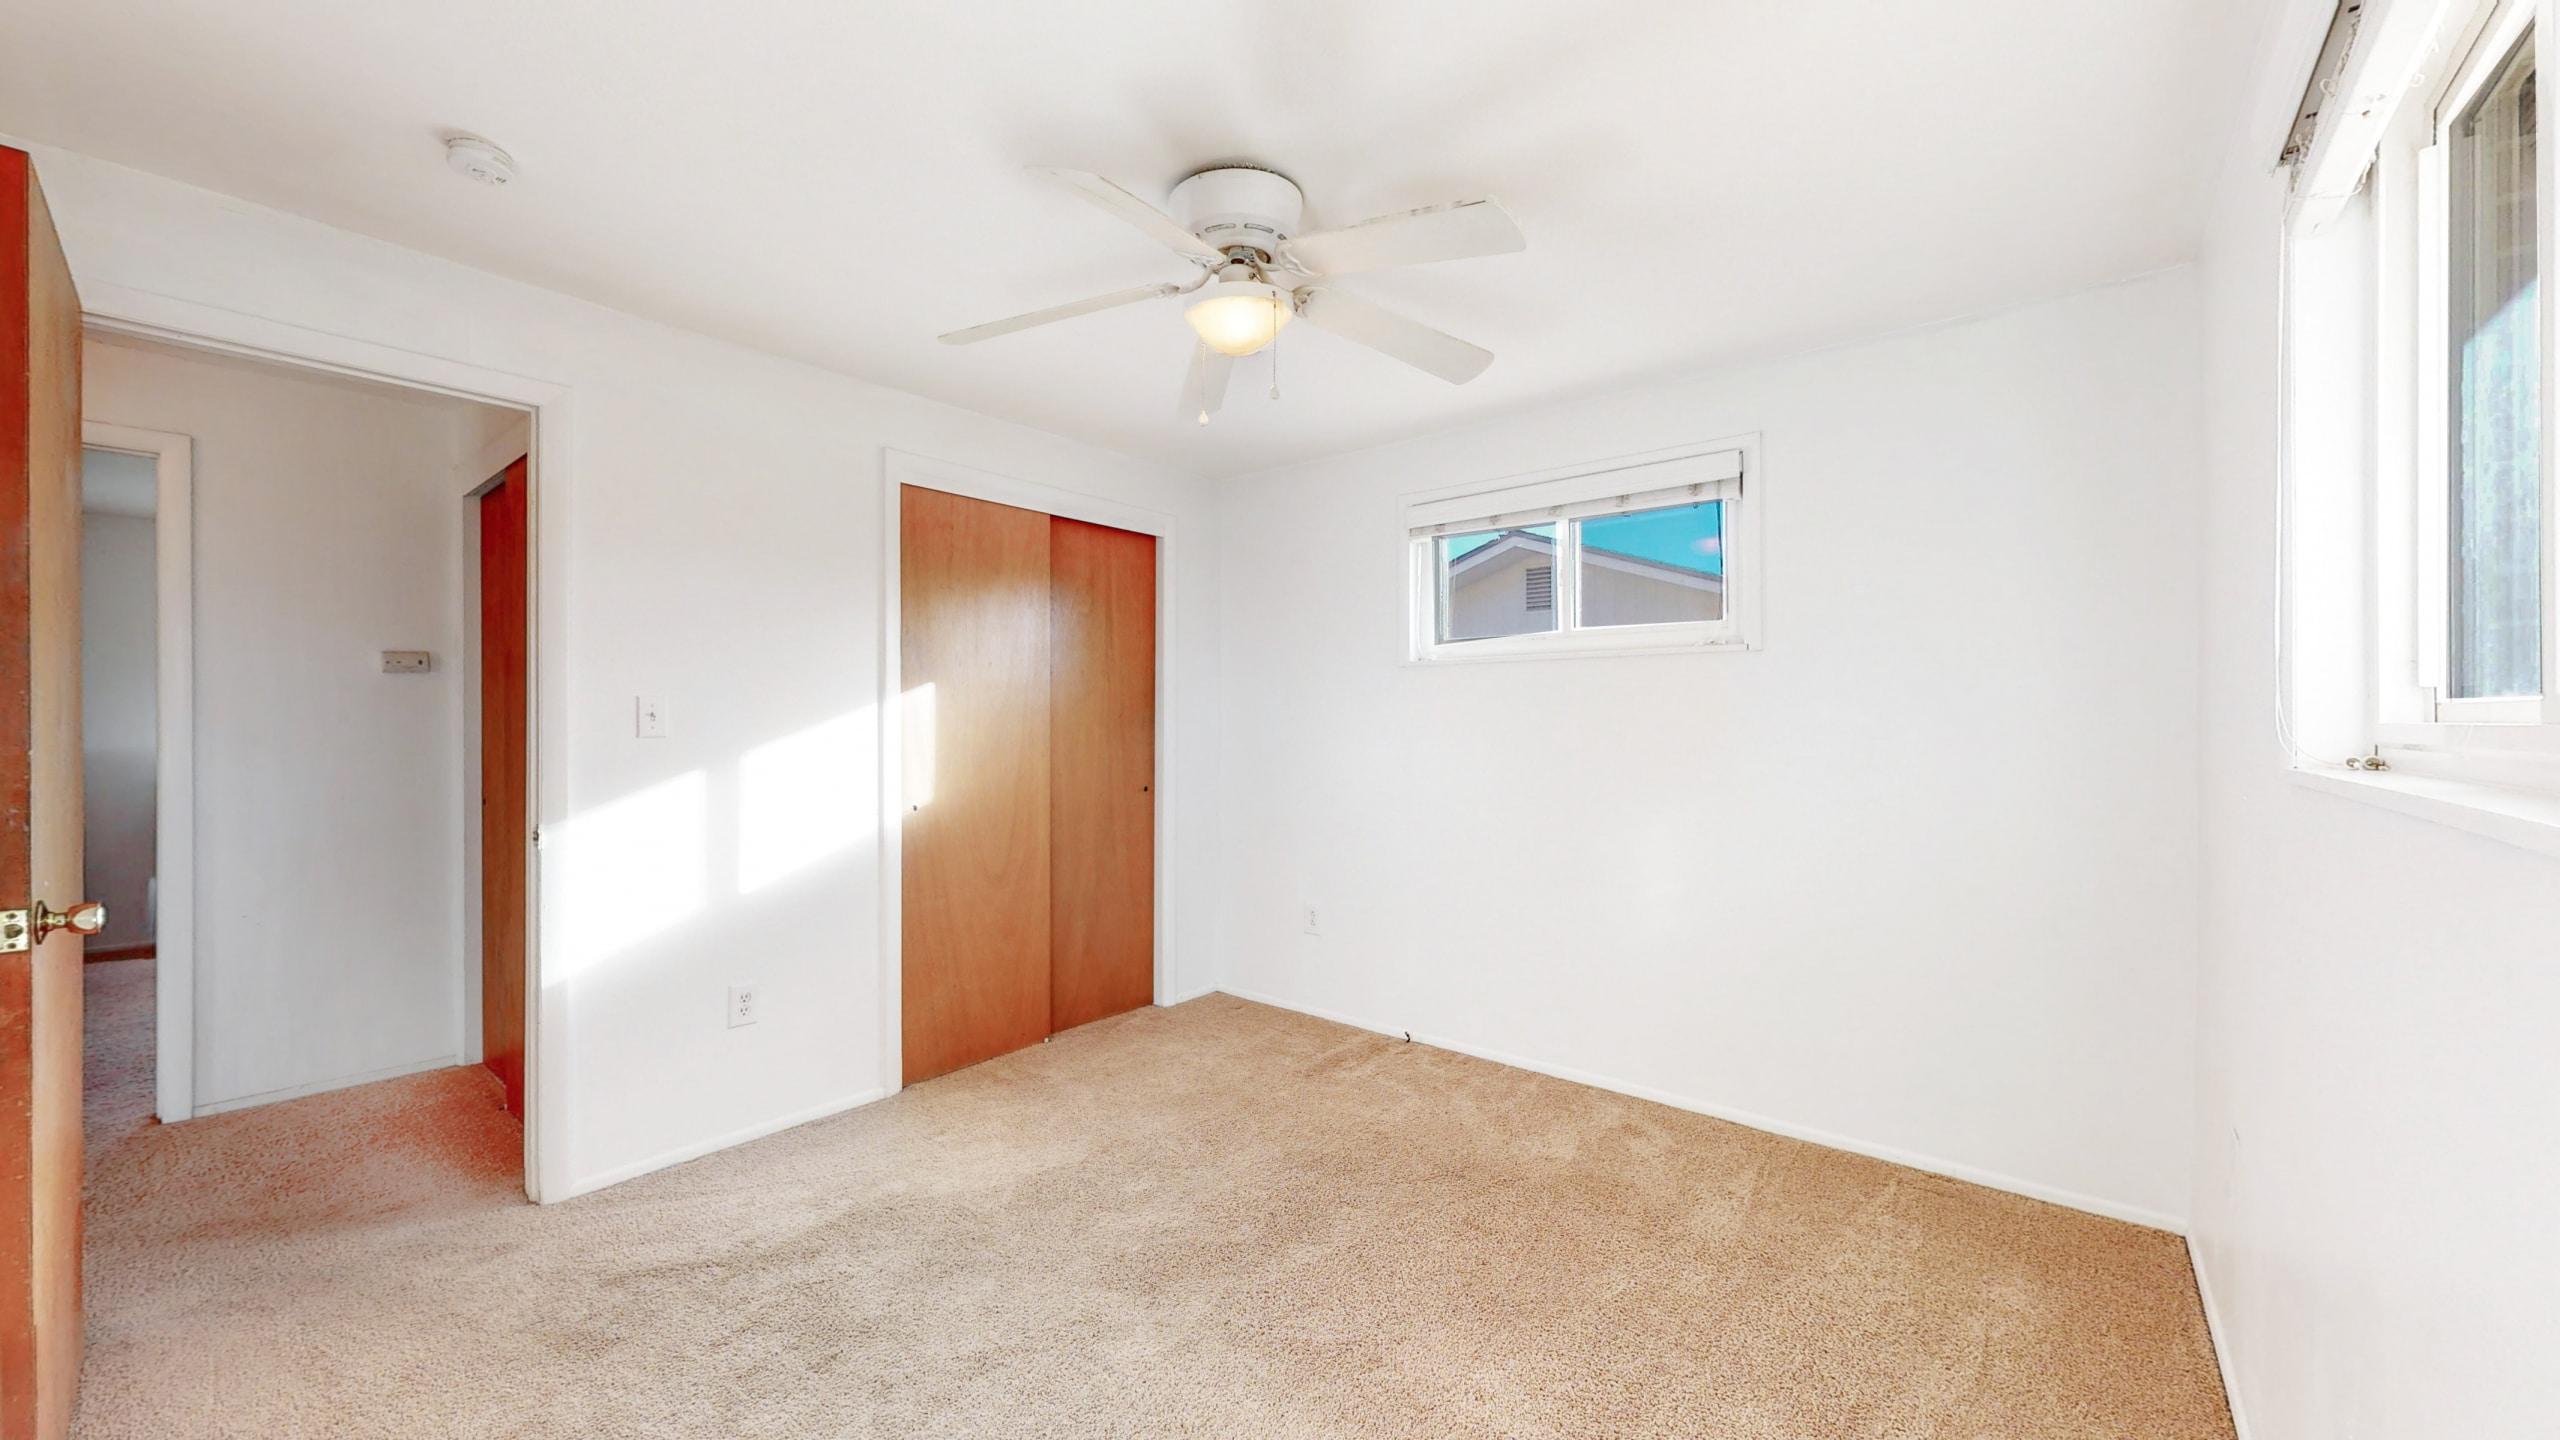 Arvada Home For Sale, Medium Bedroom, White Walls, Ceiling Fan, Brown Carpet